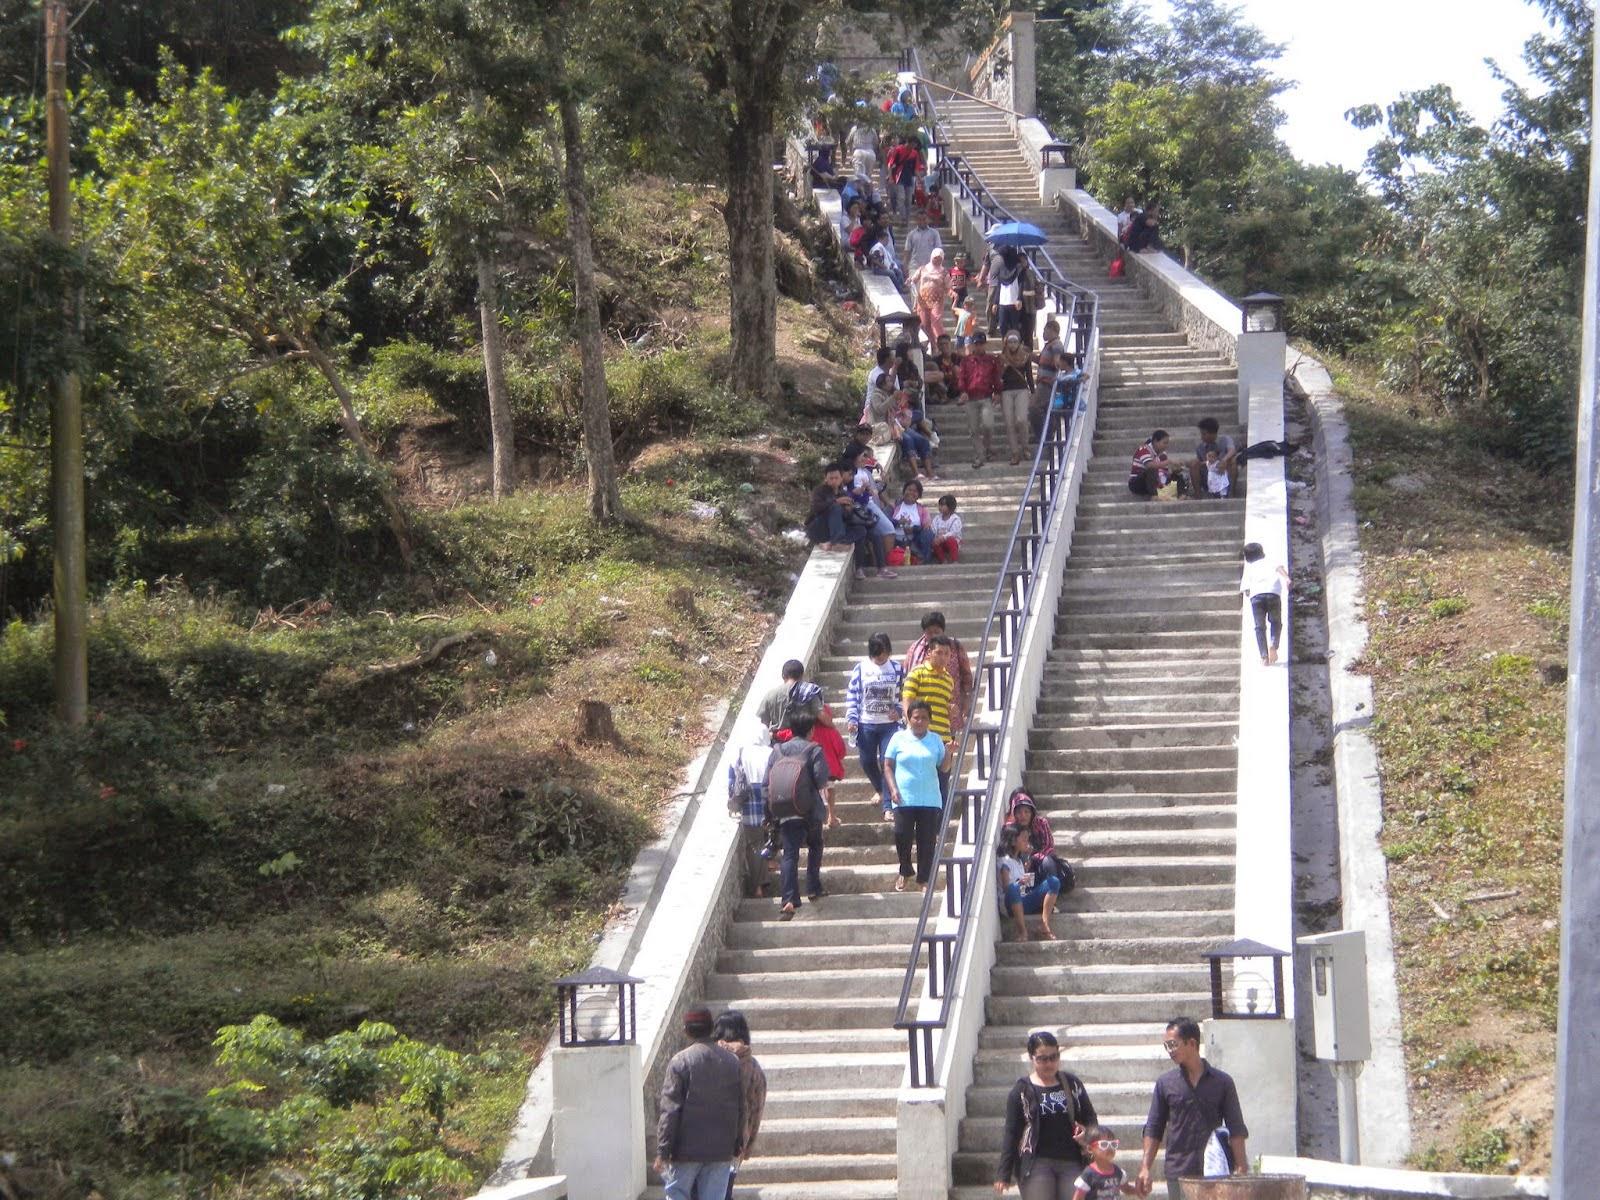 Goa Kreo Wisata Semarang  Tempat Wisata Di Semarang Yang Harus Anda Kunjungi Part